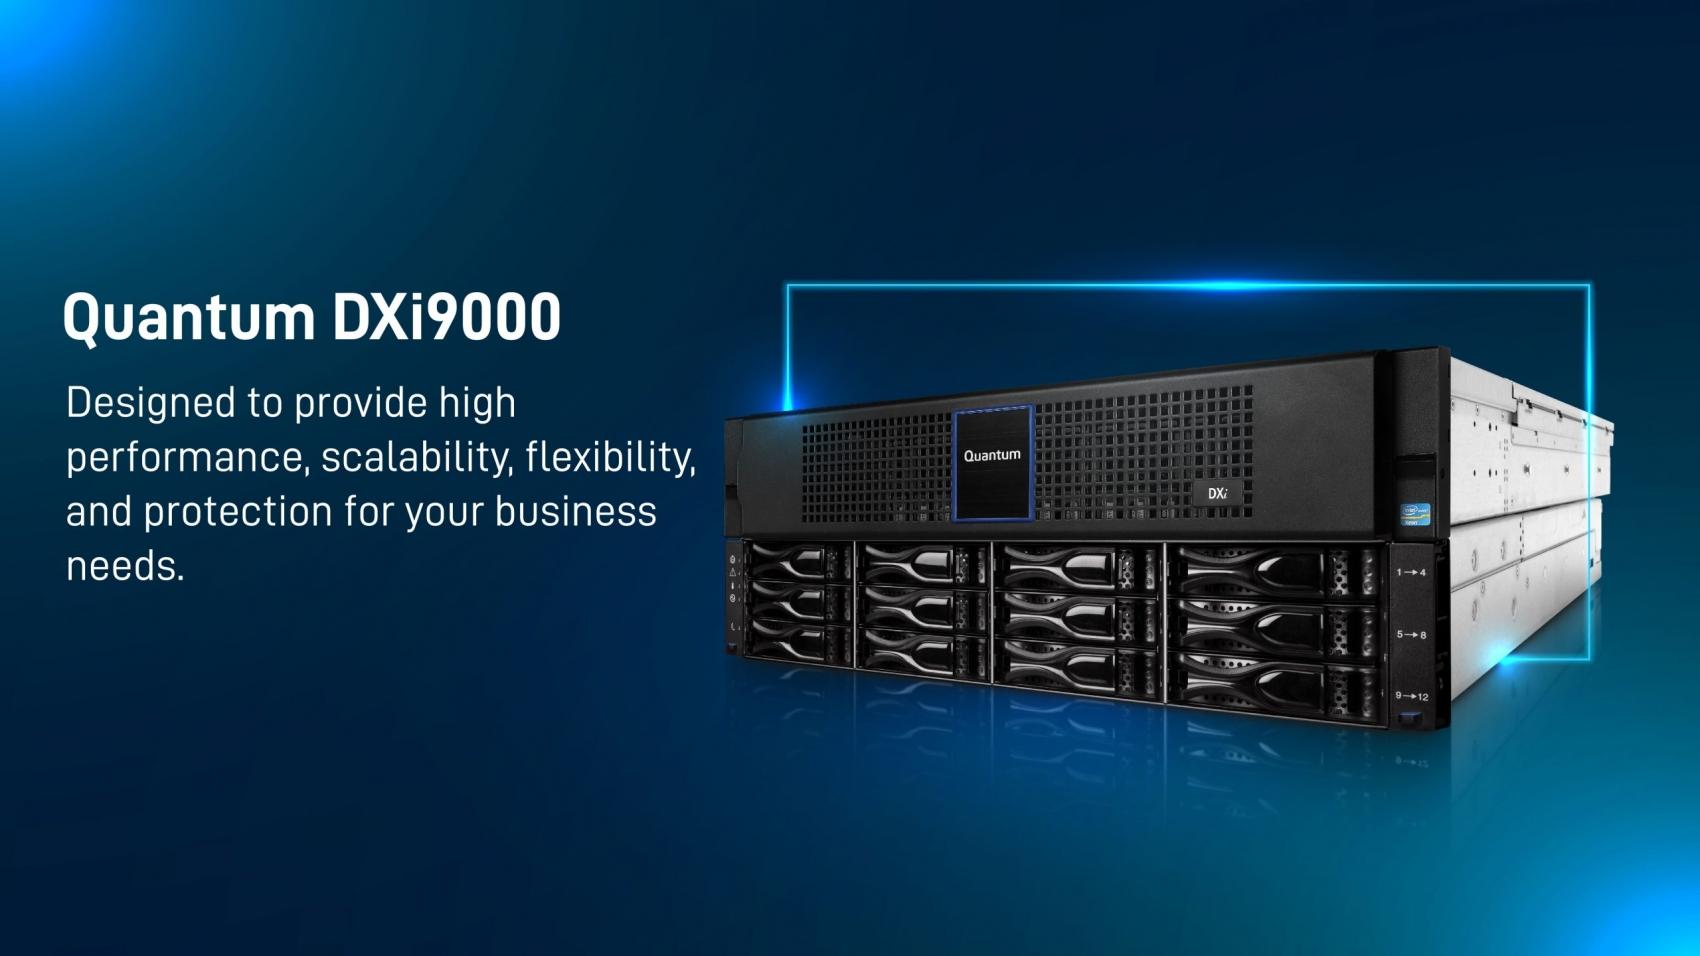 Quantum-ESG-Technical-Validation-Dxi9000-Deduplication-Appliance